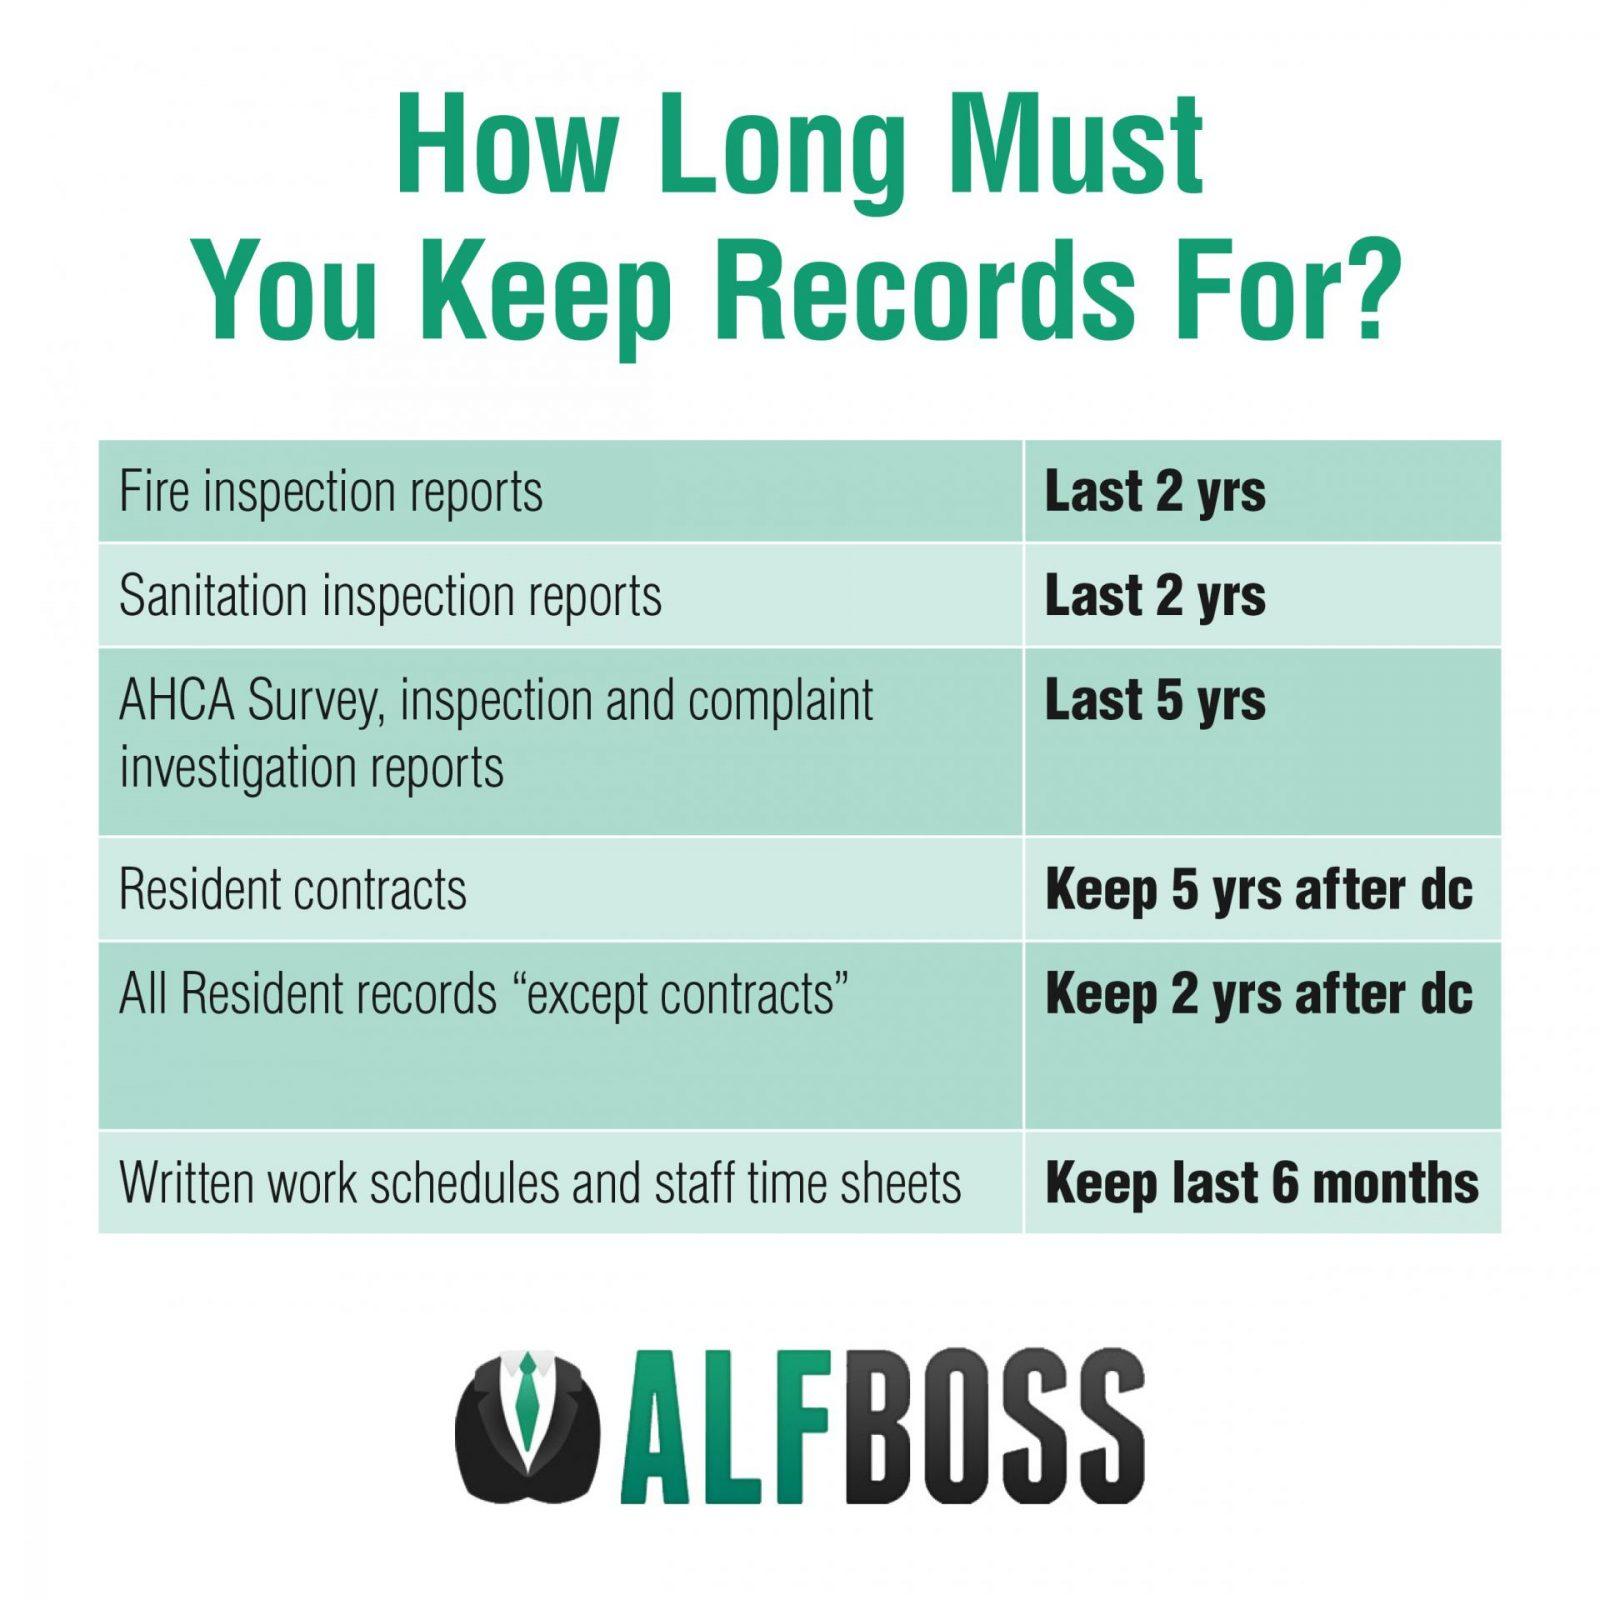 ALF Boss records